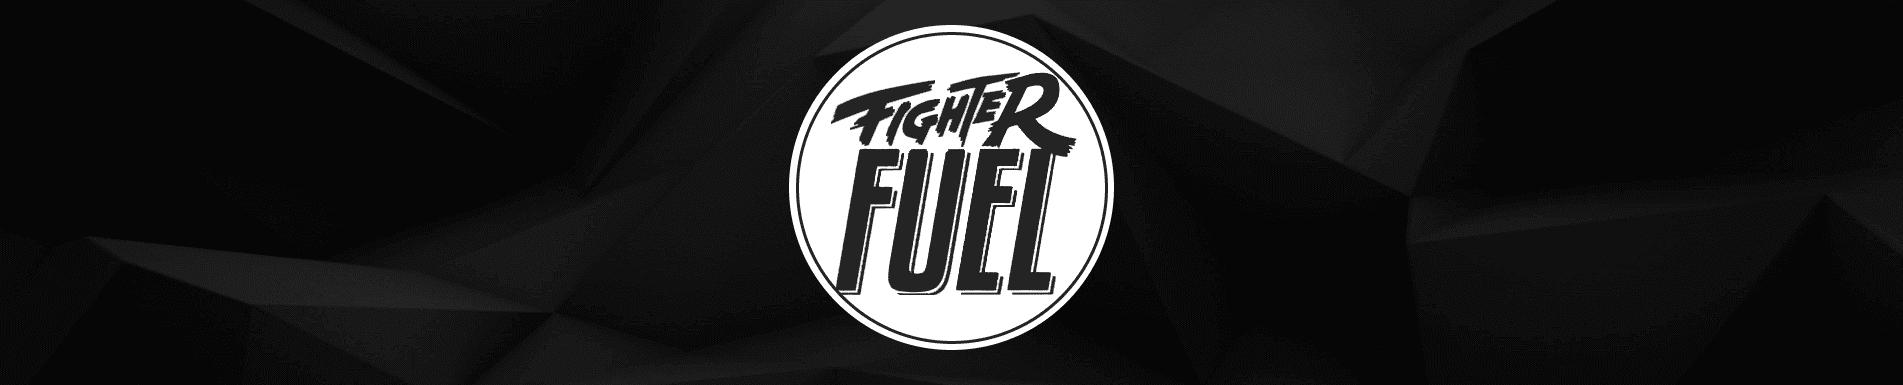 mix n vape 100 ml fighter fuel